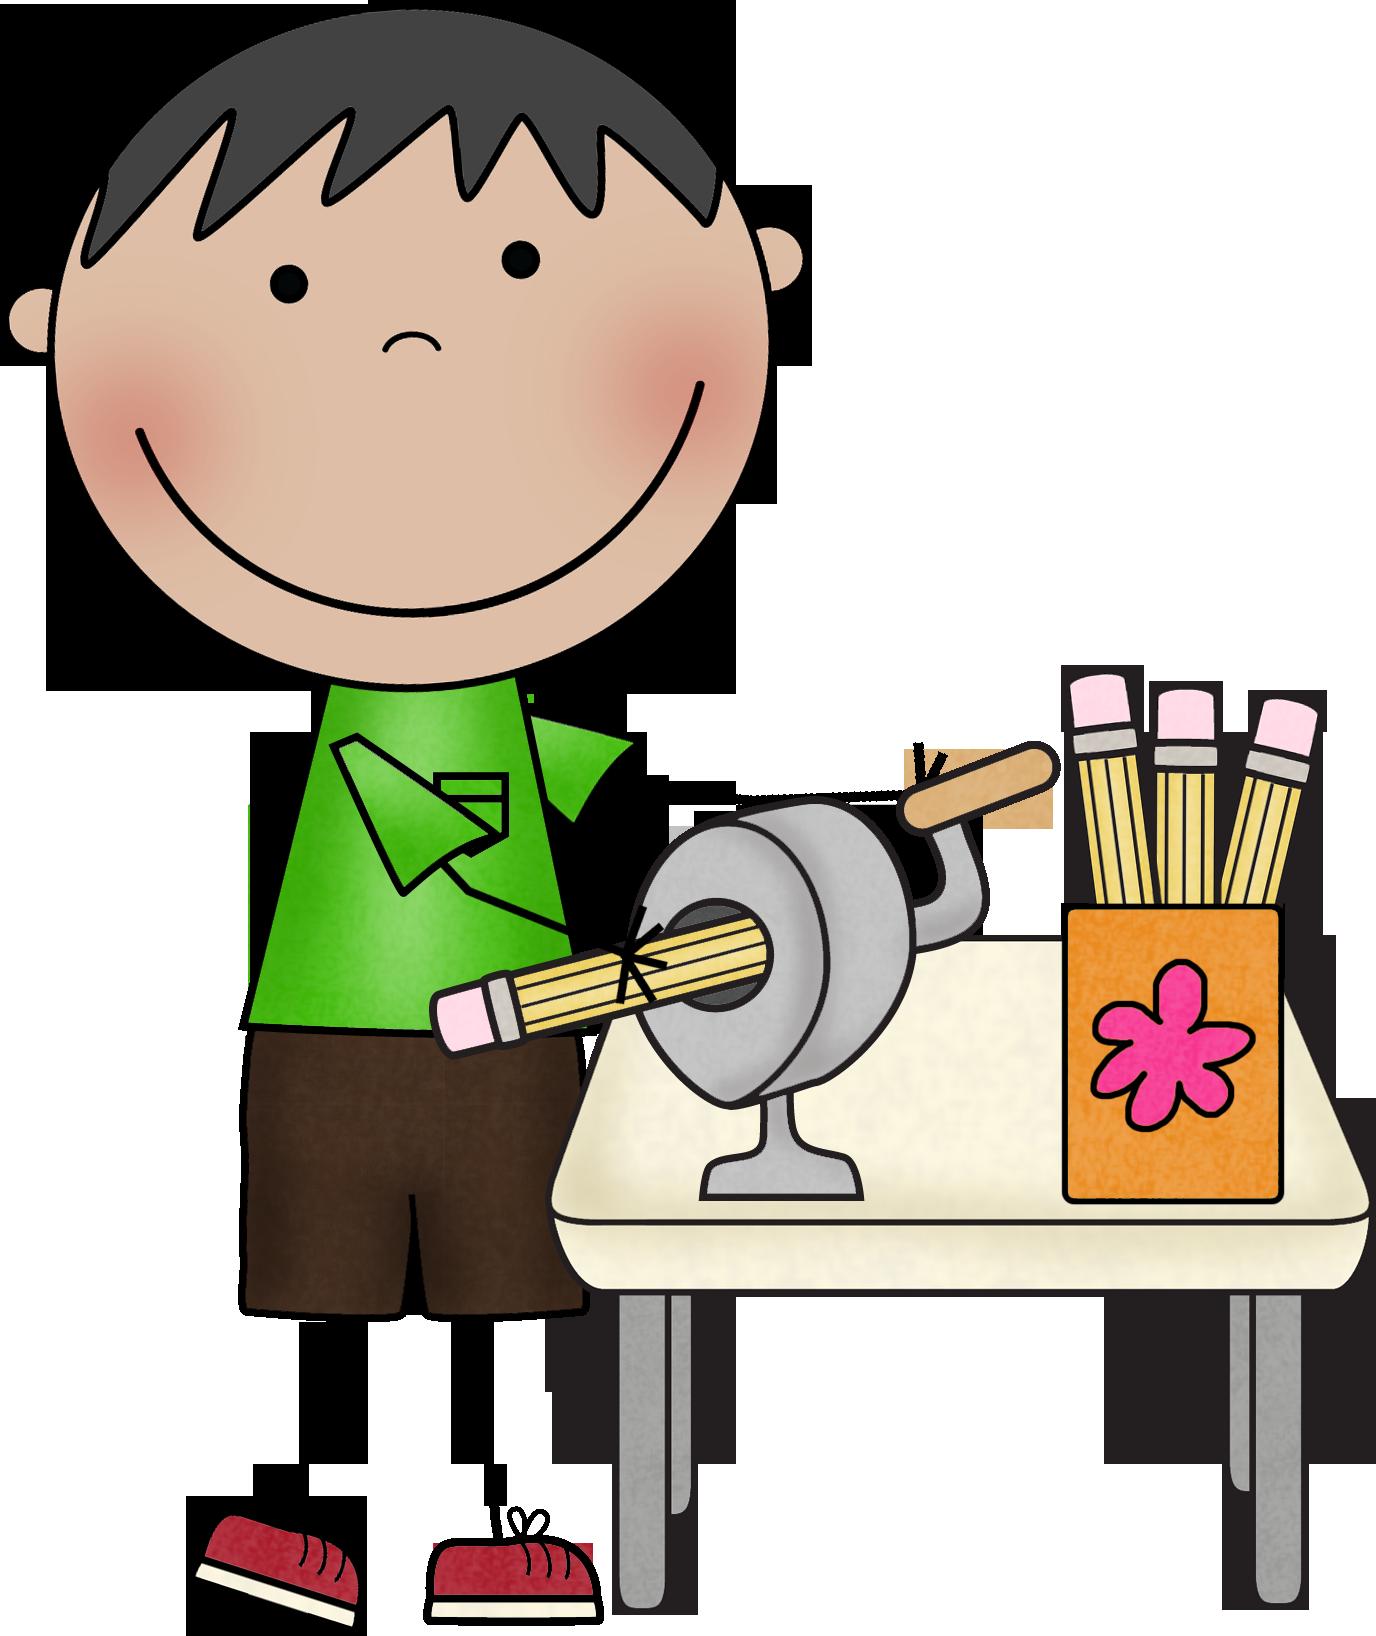 Teacher assistant clipart clip art free library Free Teacher Helper Cliparts, Download Free Clip Art, Free ... clip art free library